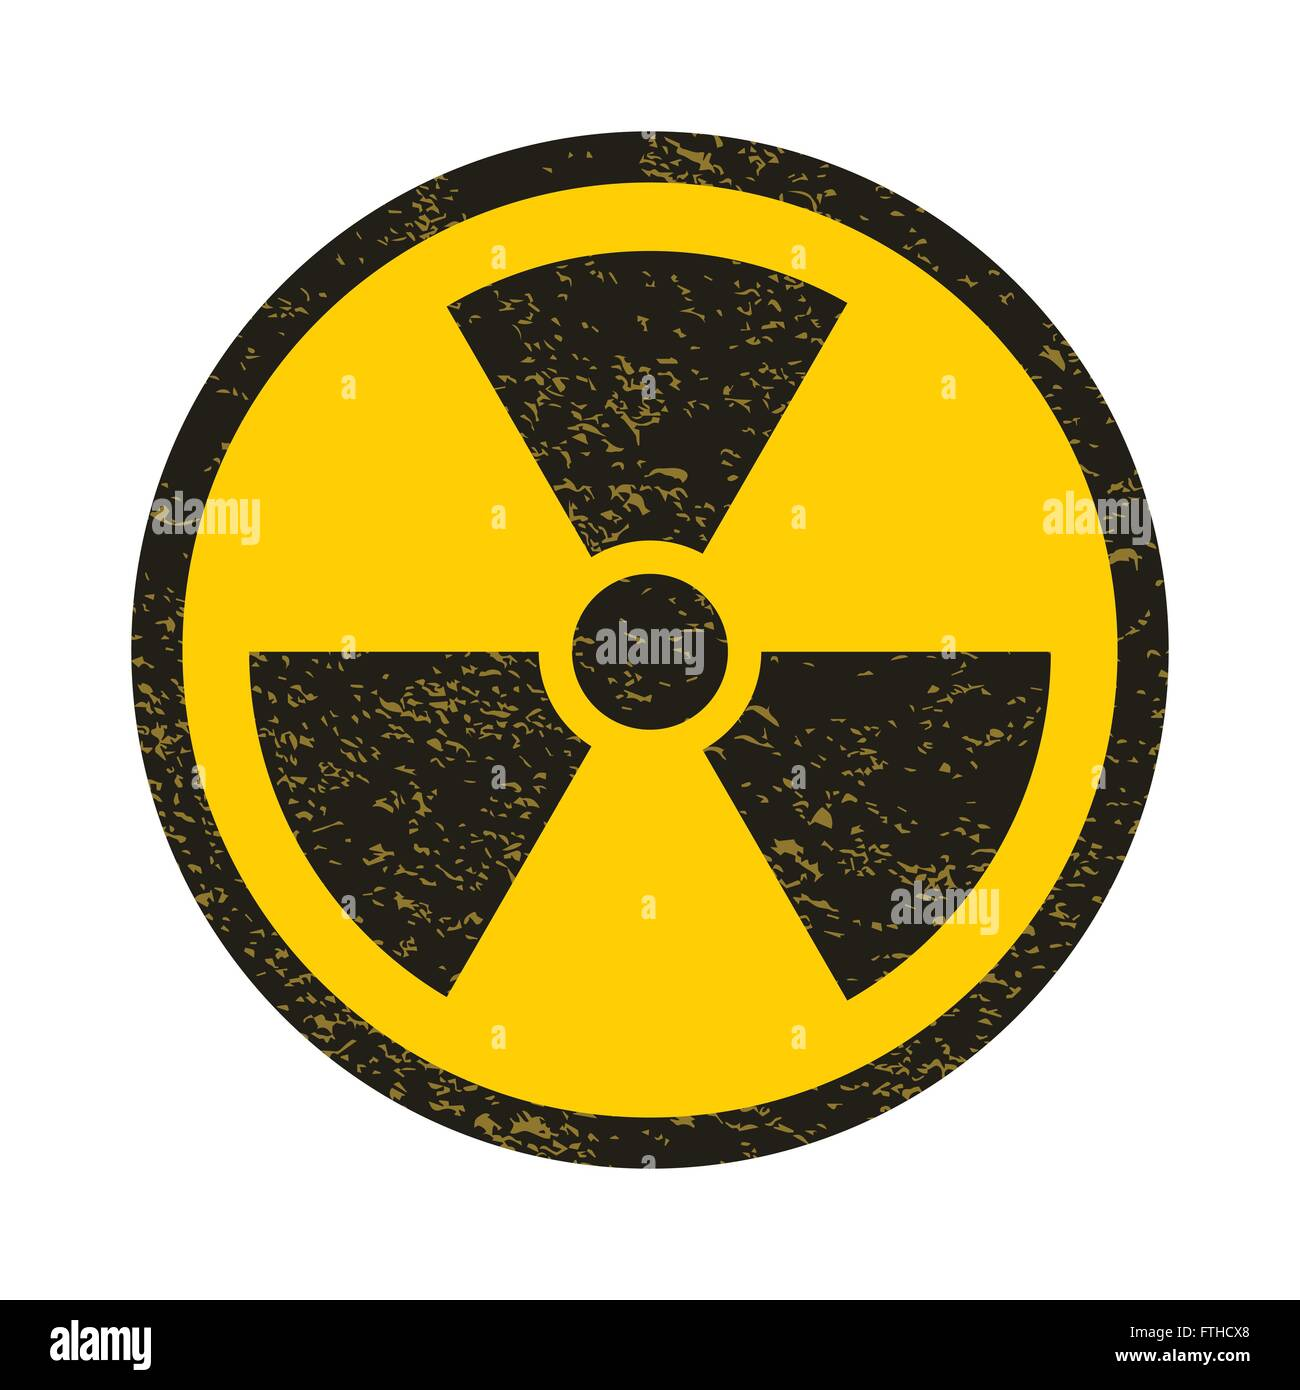 Grunge nuclear symbol vector illustration - Stock Vector